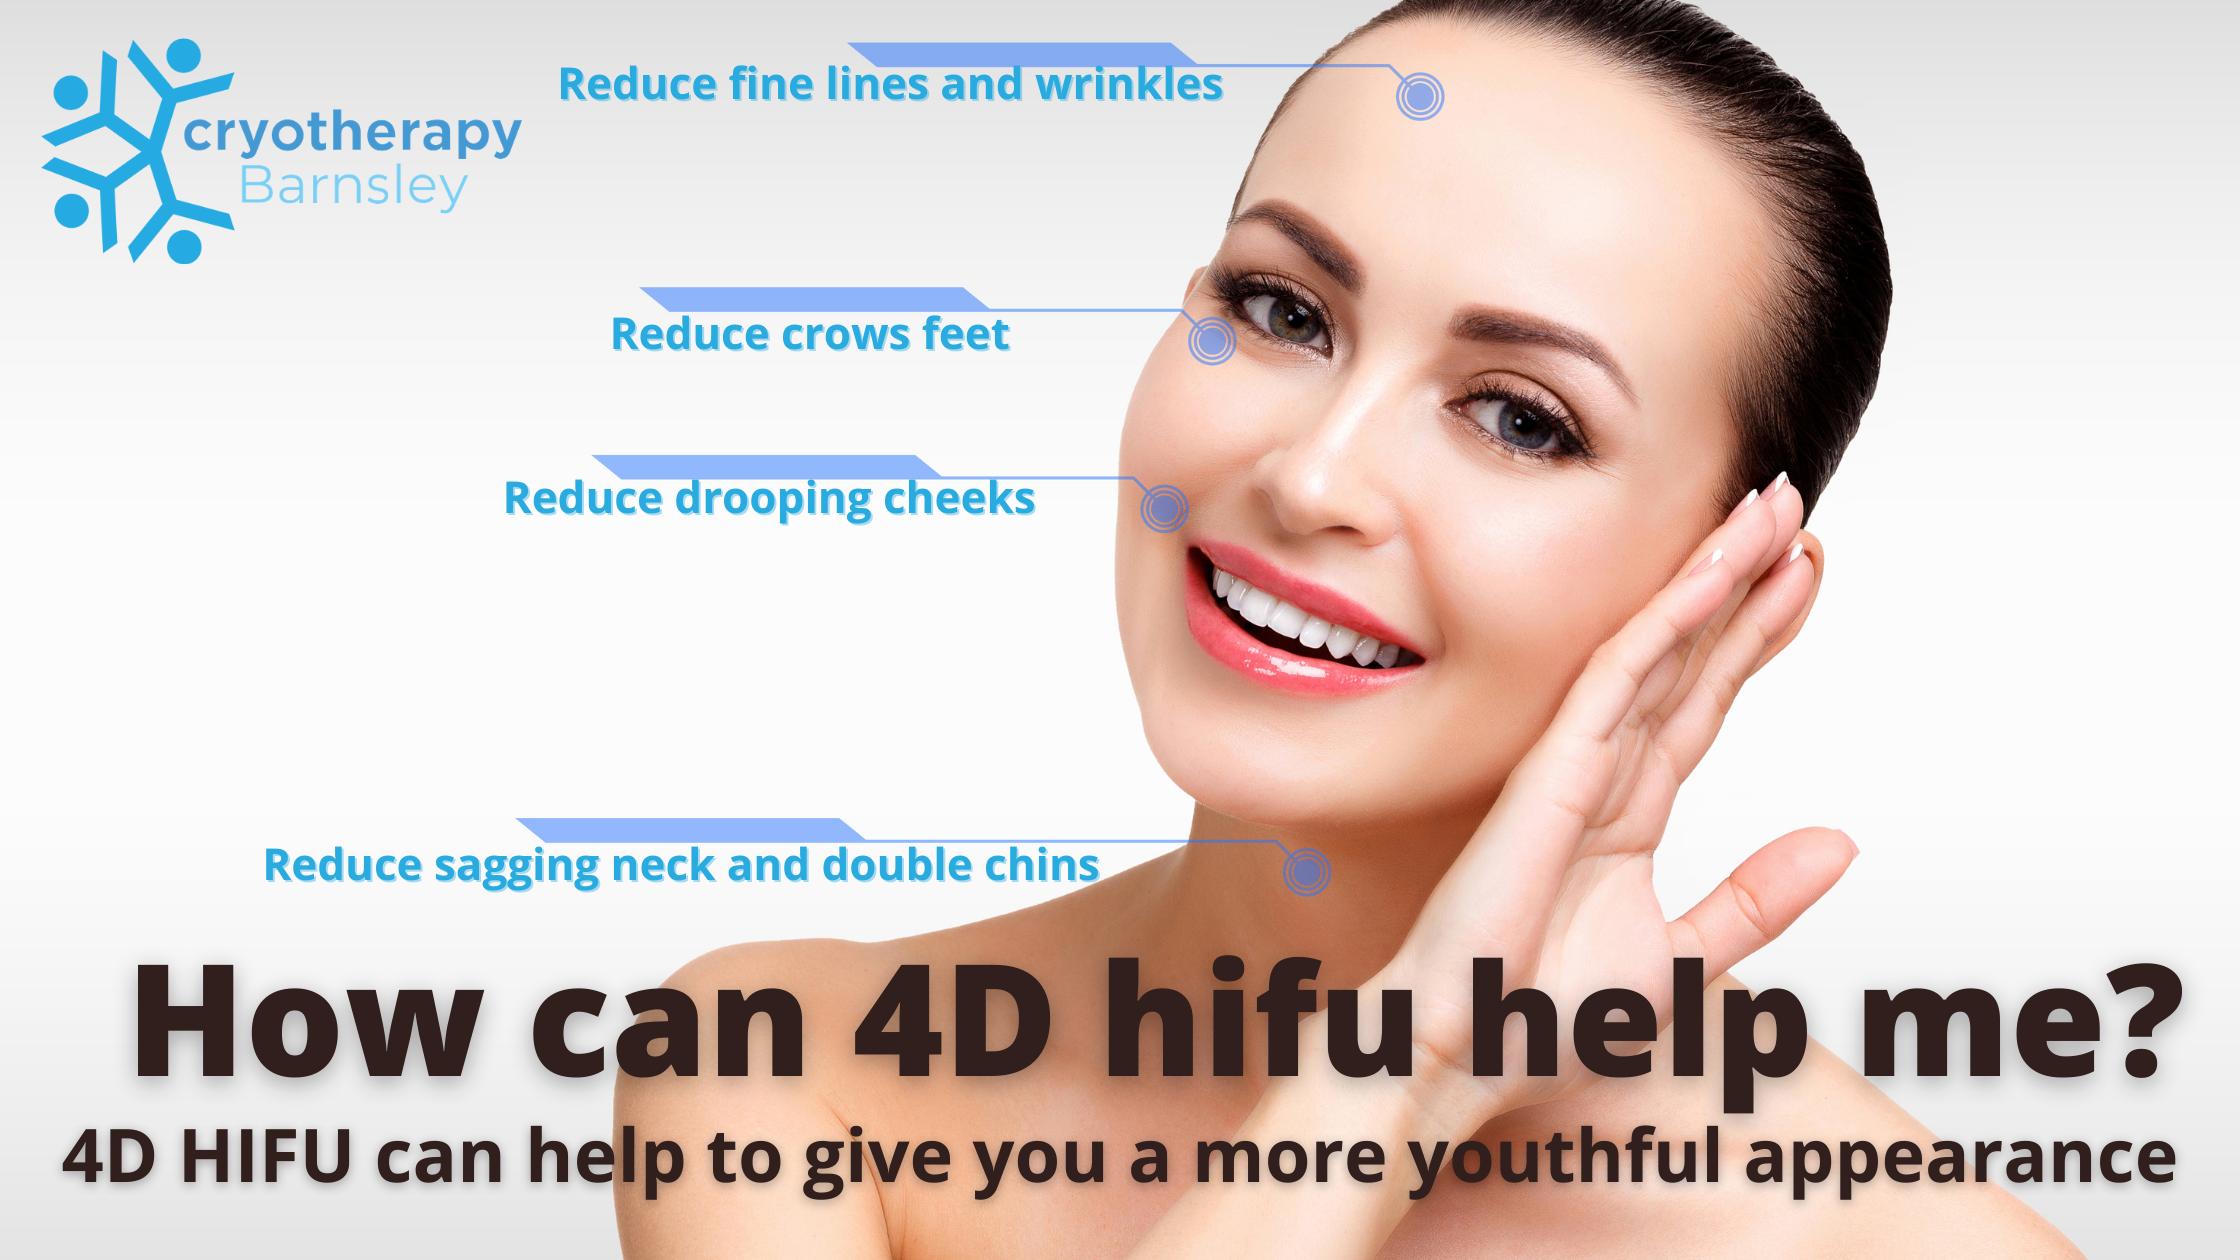 How Can 4D HIFU Help Me?